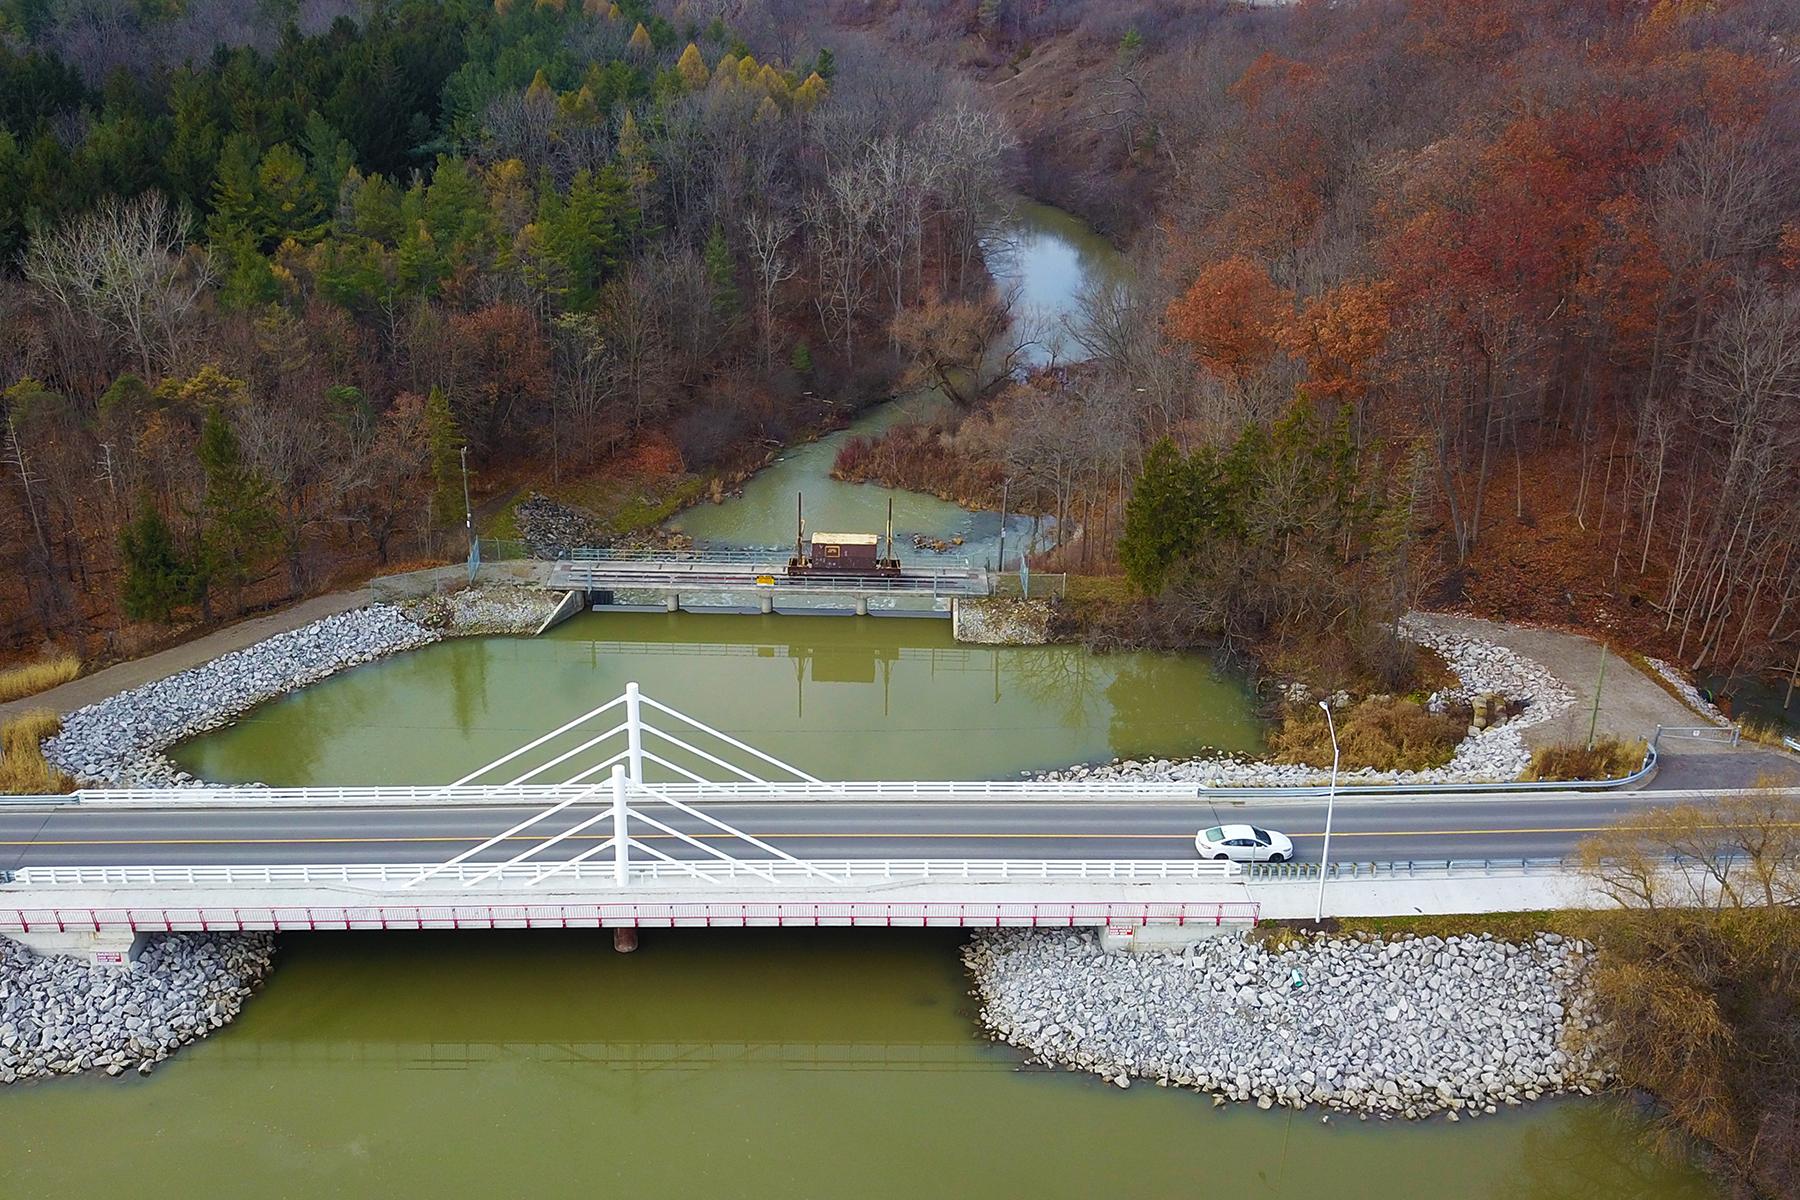 Dalewood Road Bridge Aerial View